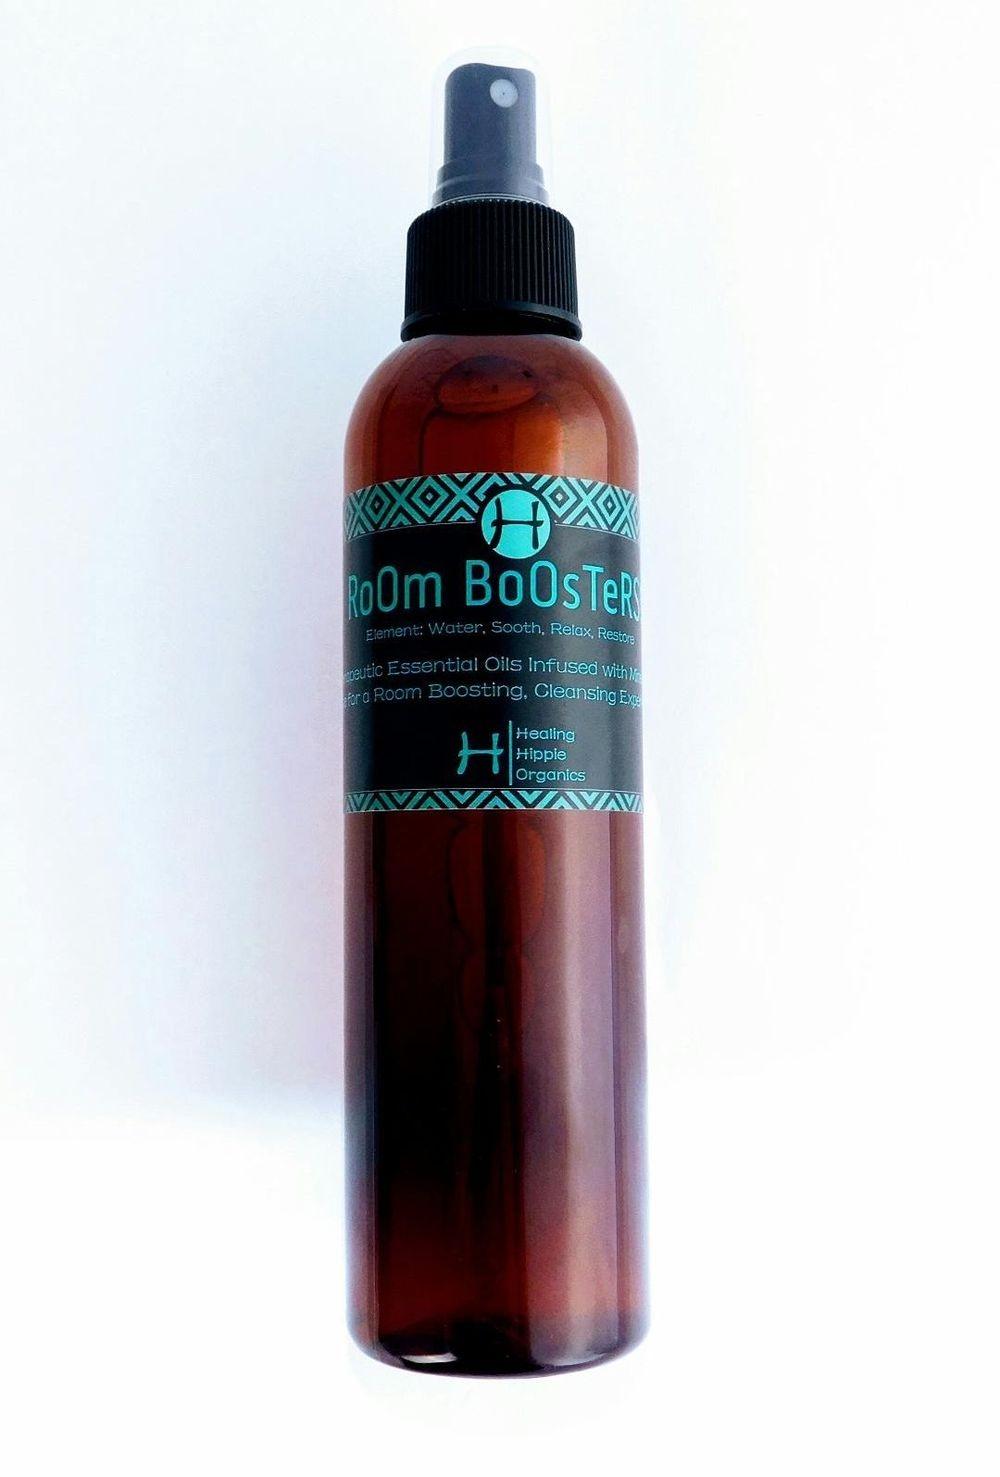 Room Booster: Water, Healing Hippie Organics, Boise, Idaho, USA